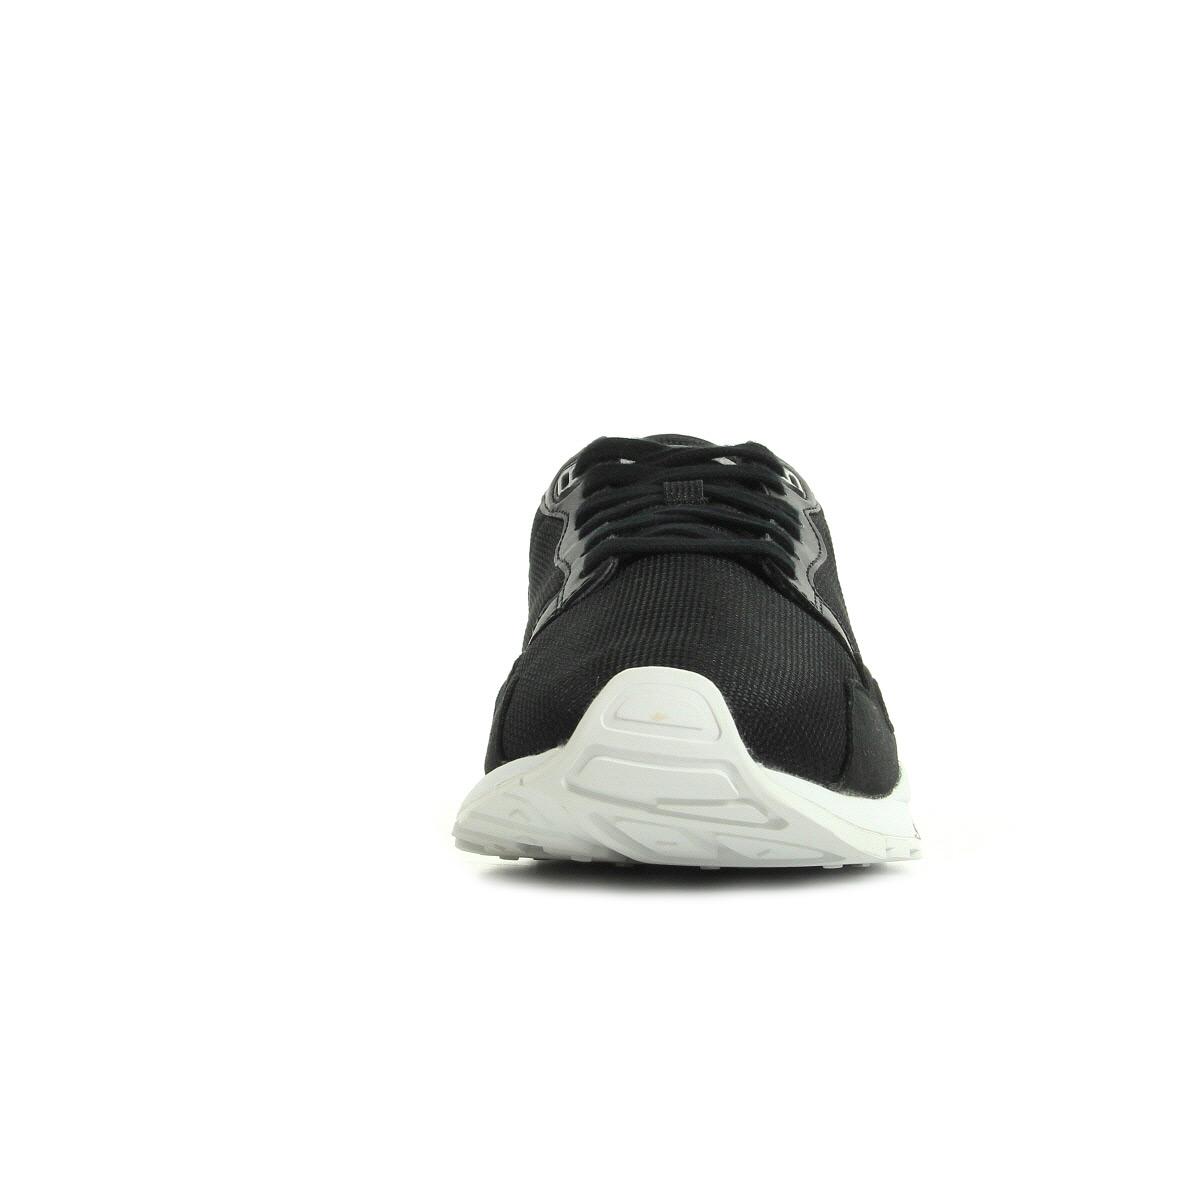 Le Coq Sportif LCS R 900 1520691, Baskets mode